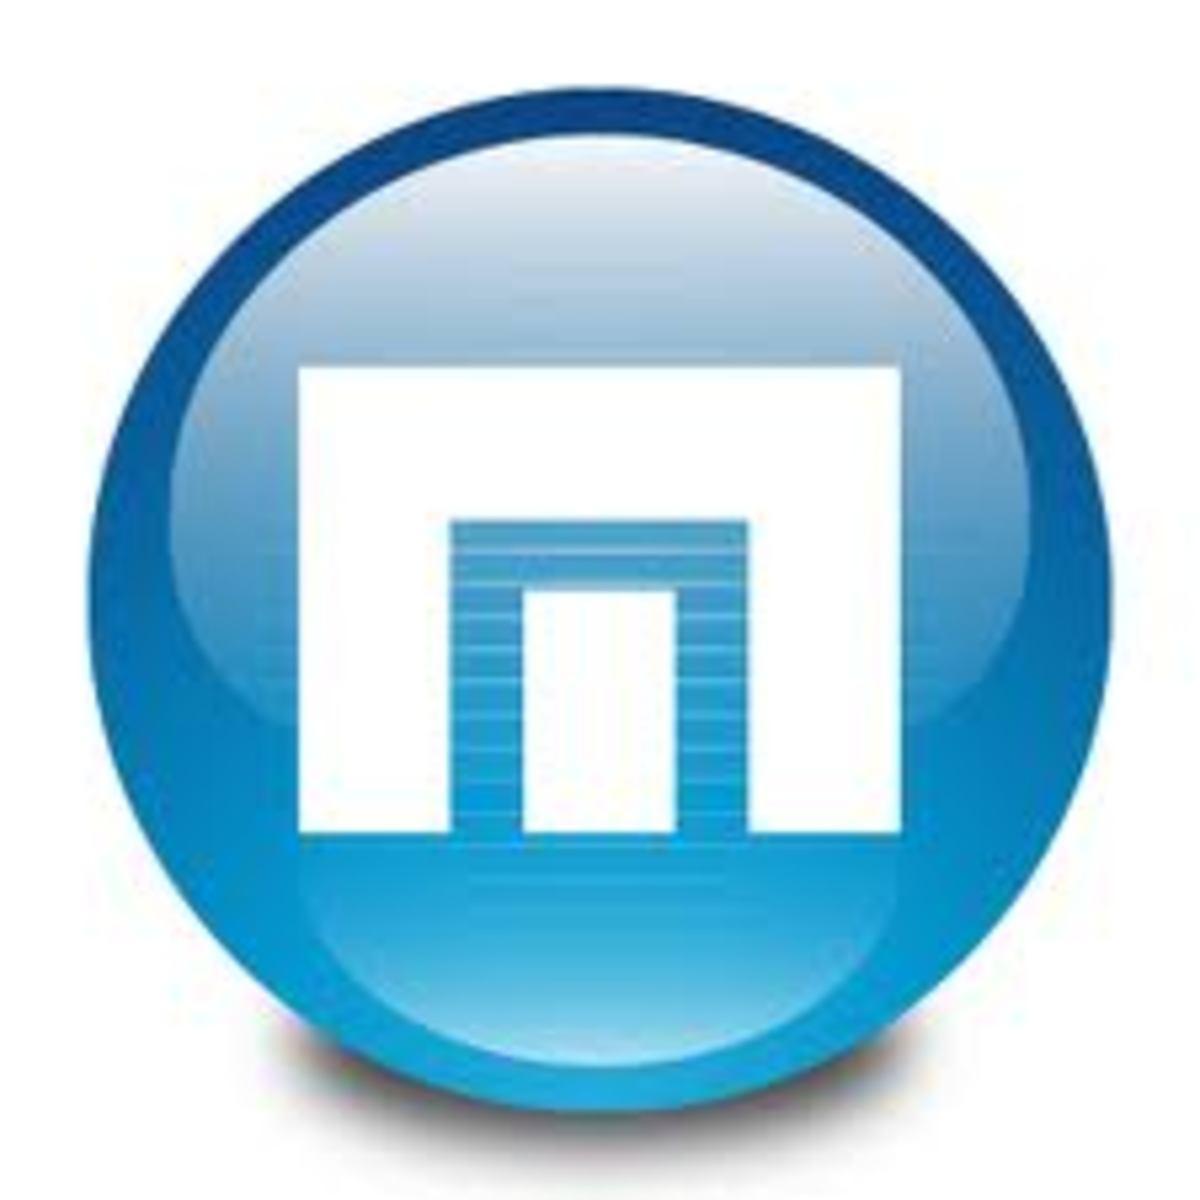 Maxthon Browser logo